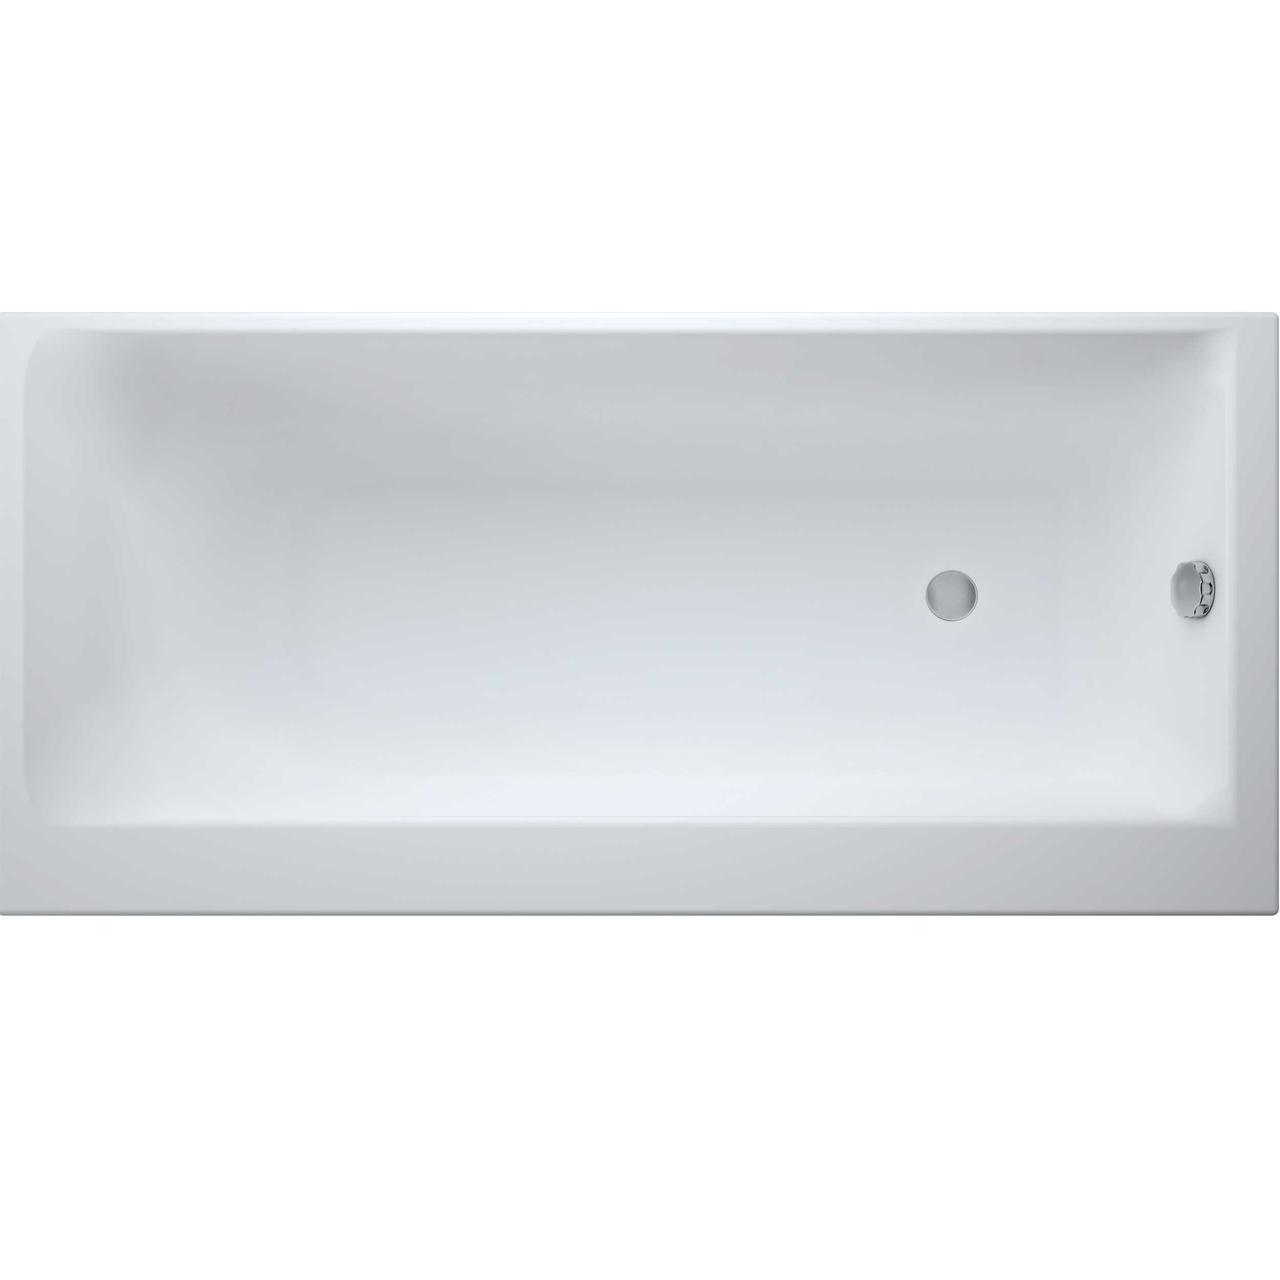 Ванны Cersanit Ванна с ножками Cersanit Smart 170x80 см, левая 281823